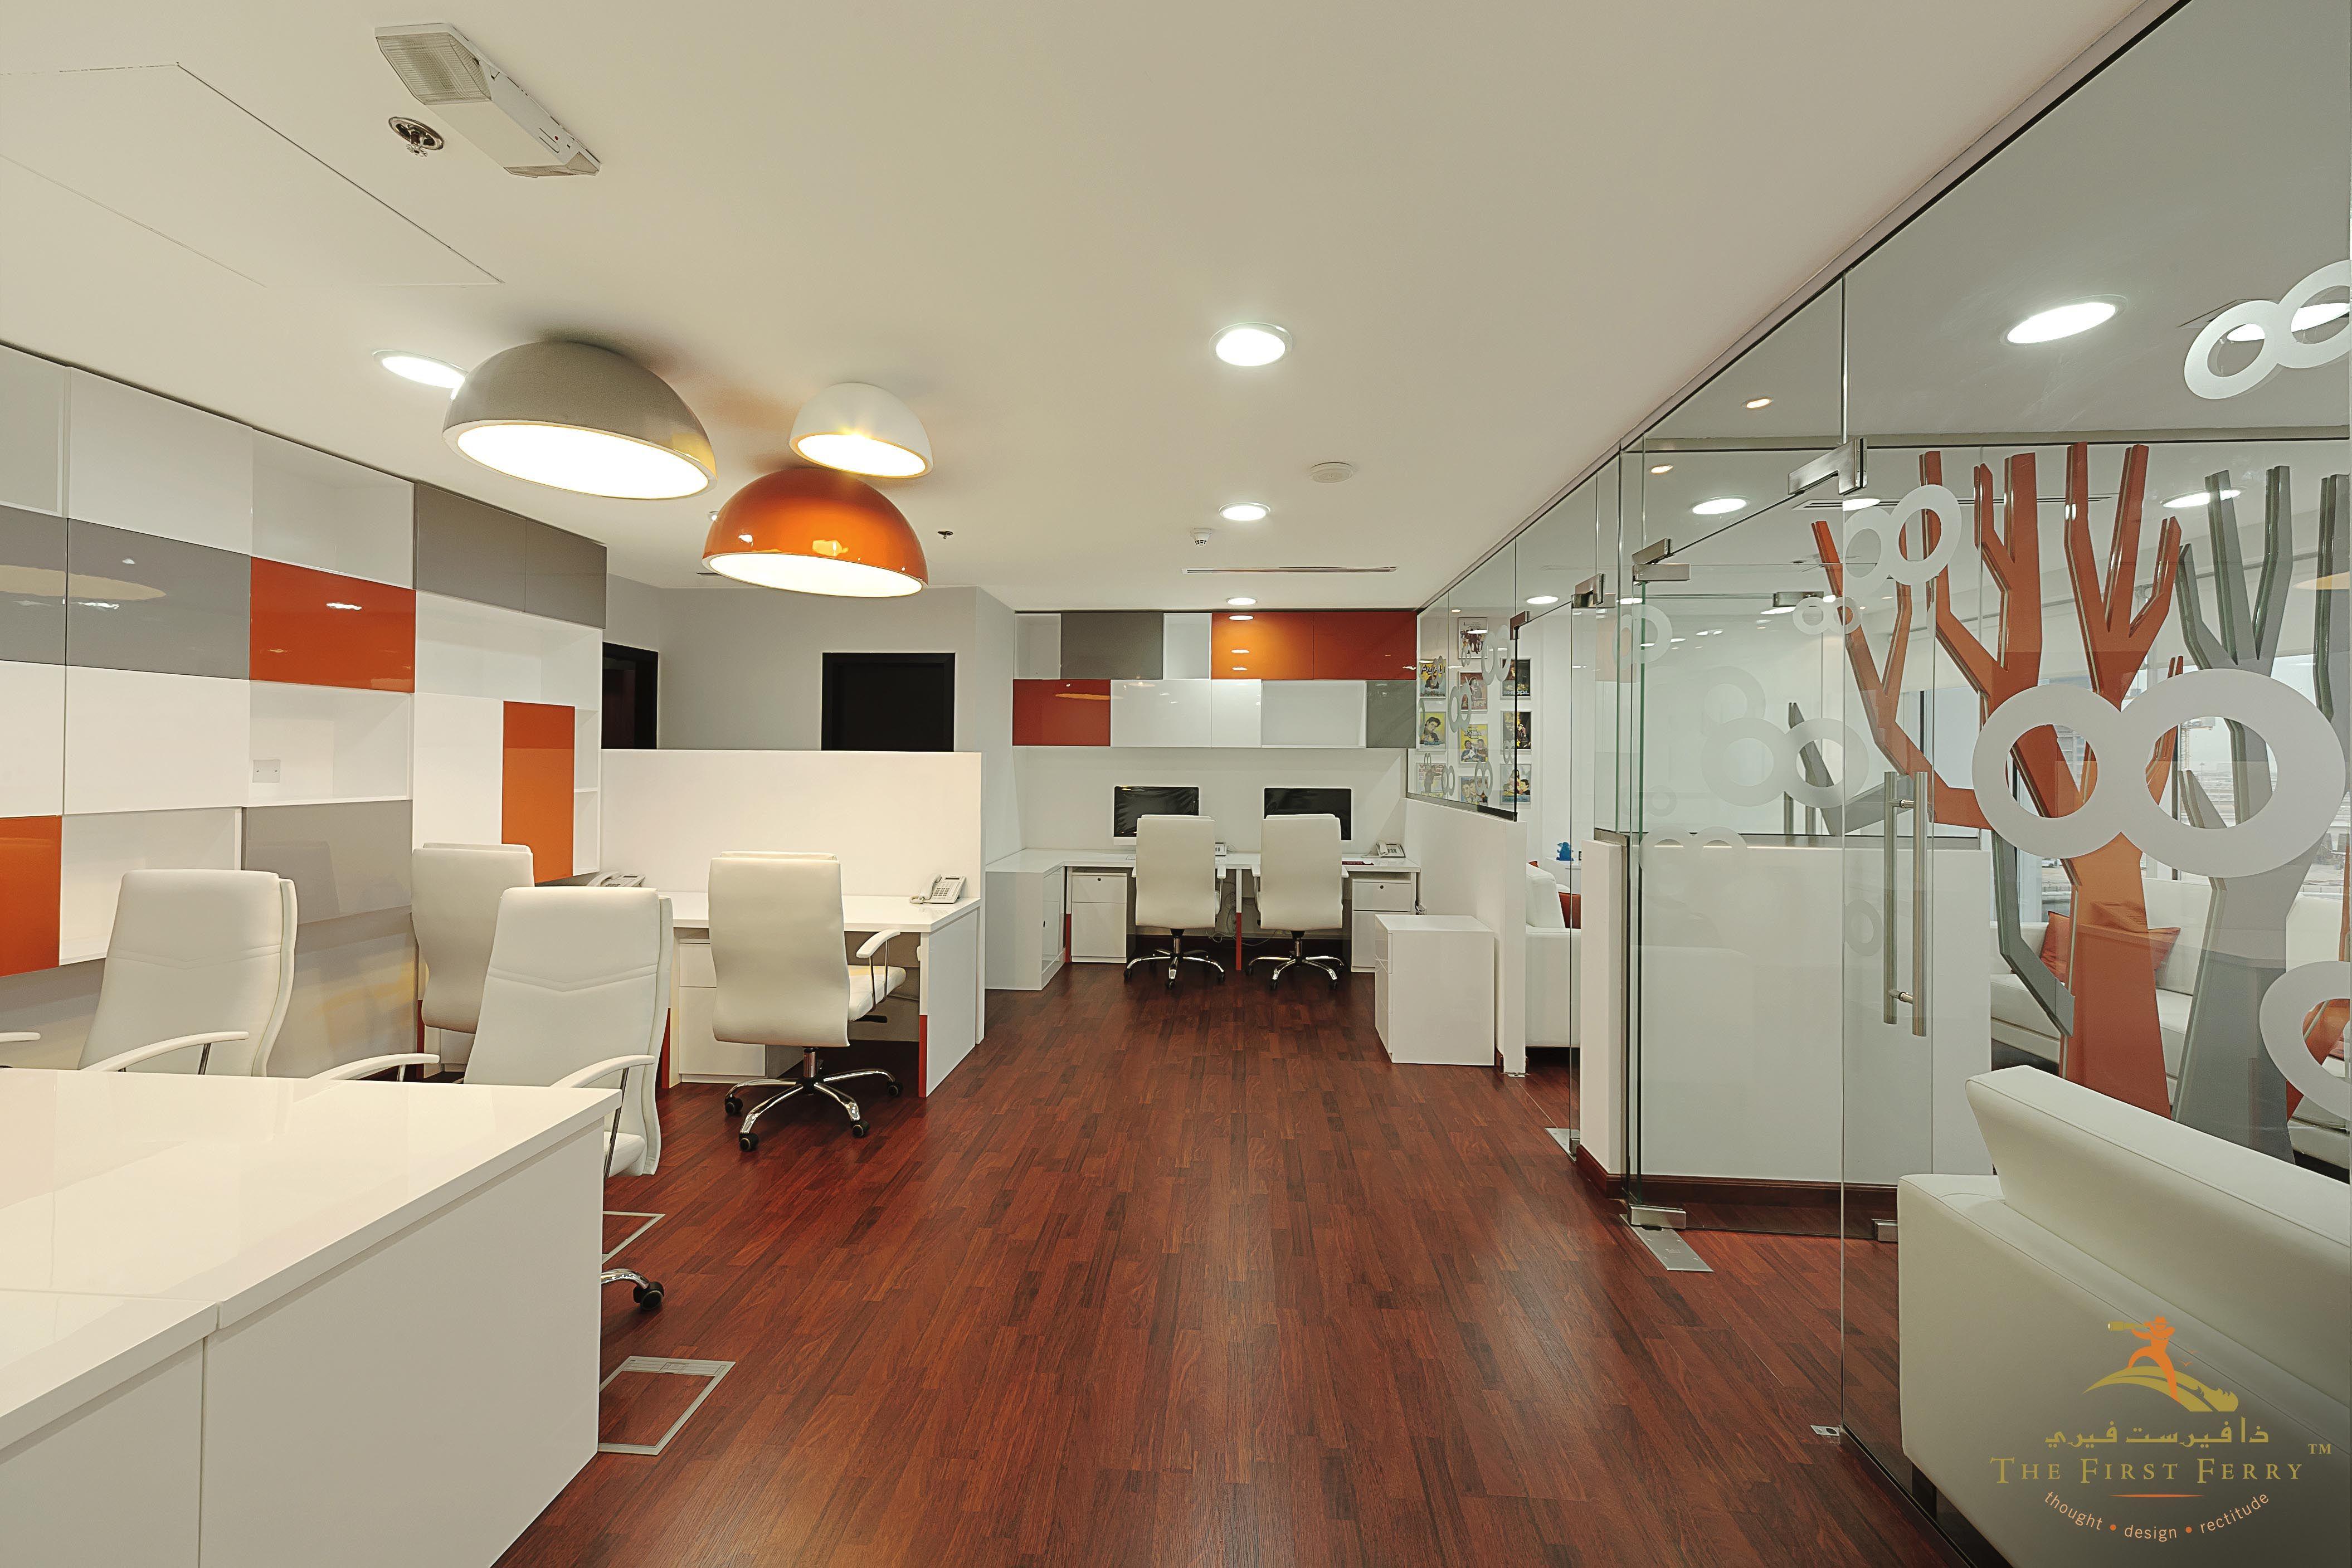 Office InteriorDesign Interiors Decor Ideatree Office Design